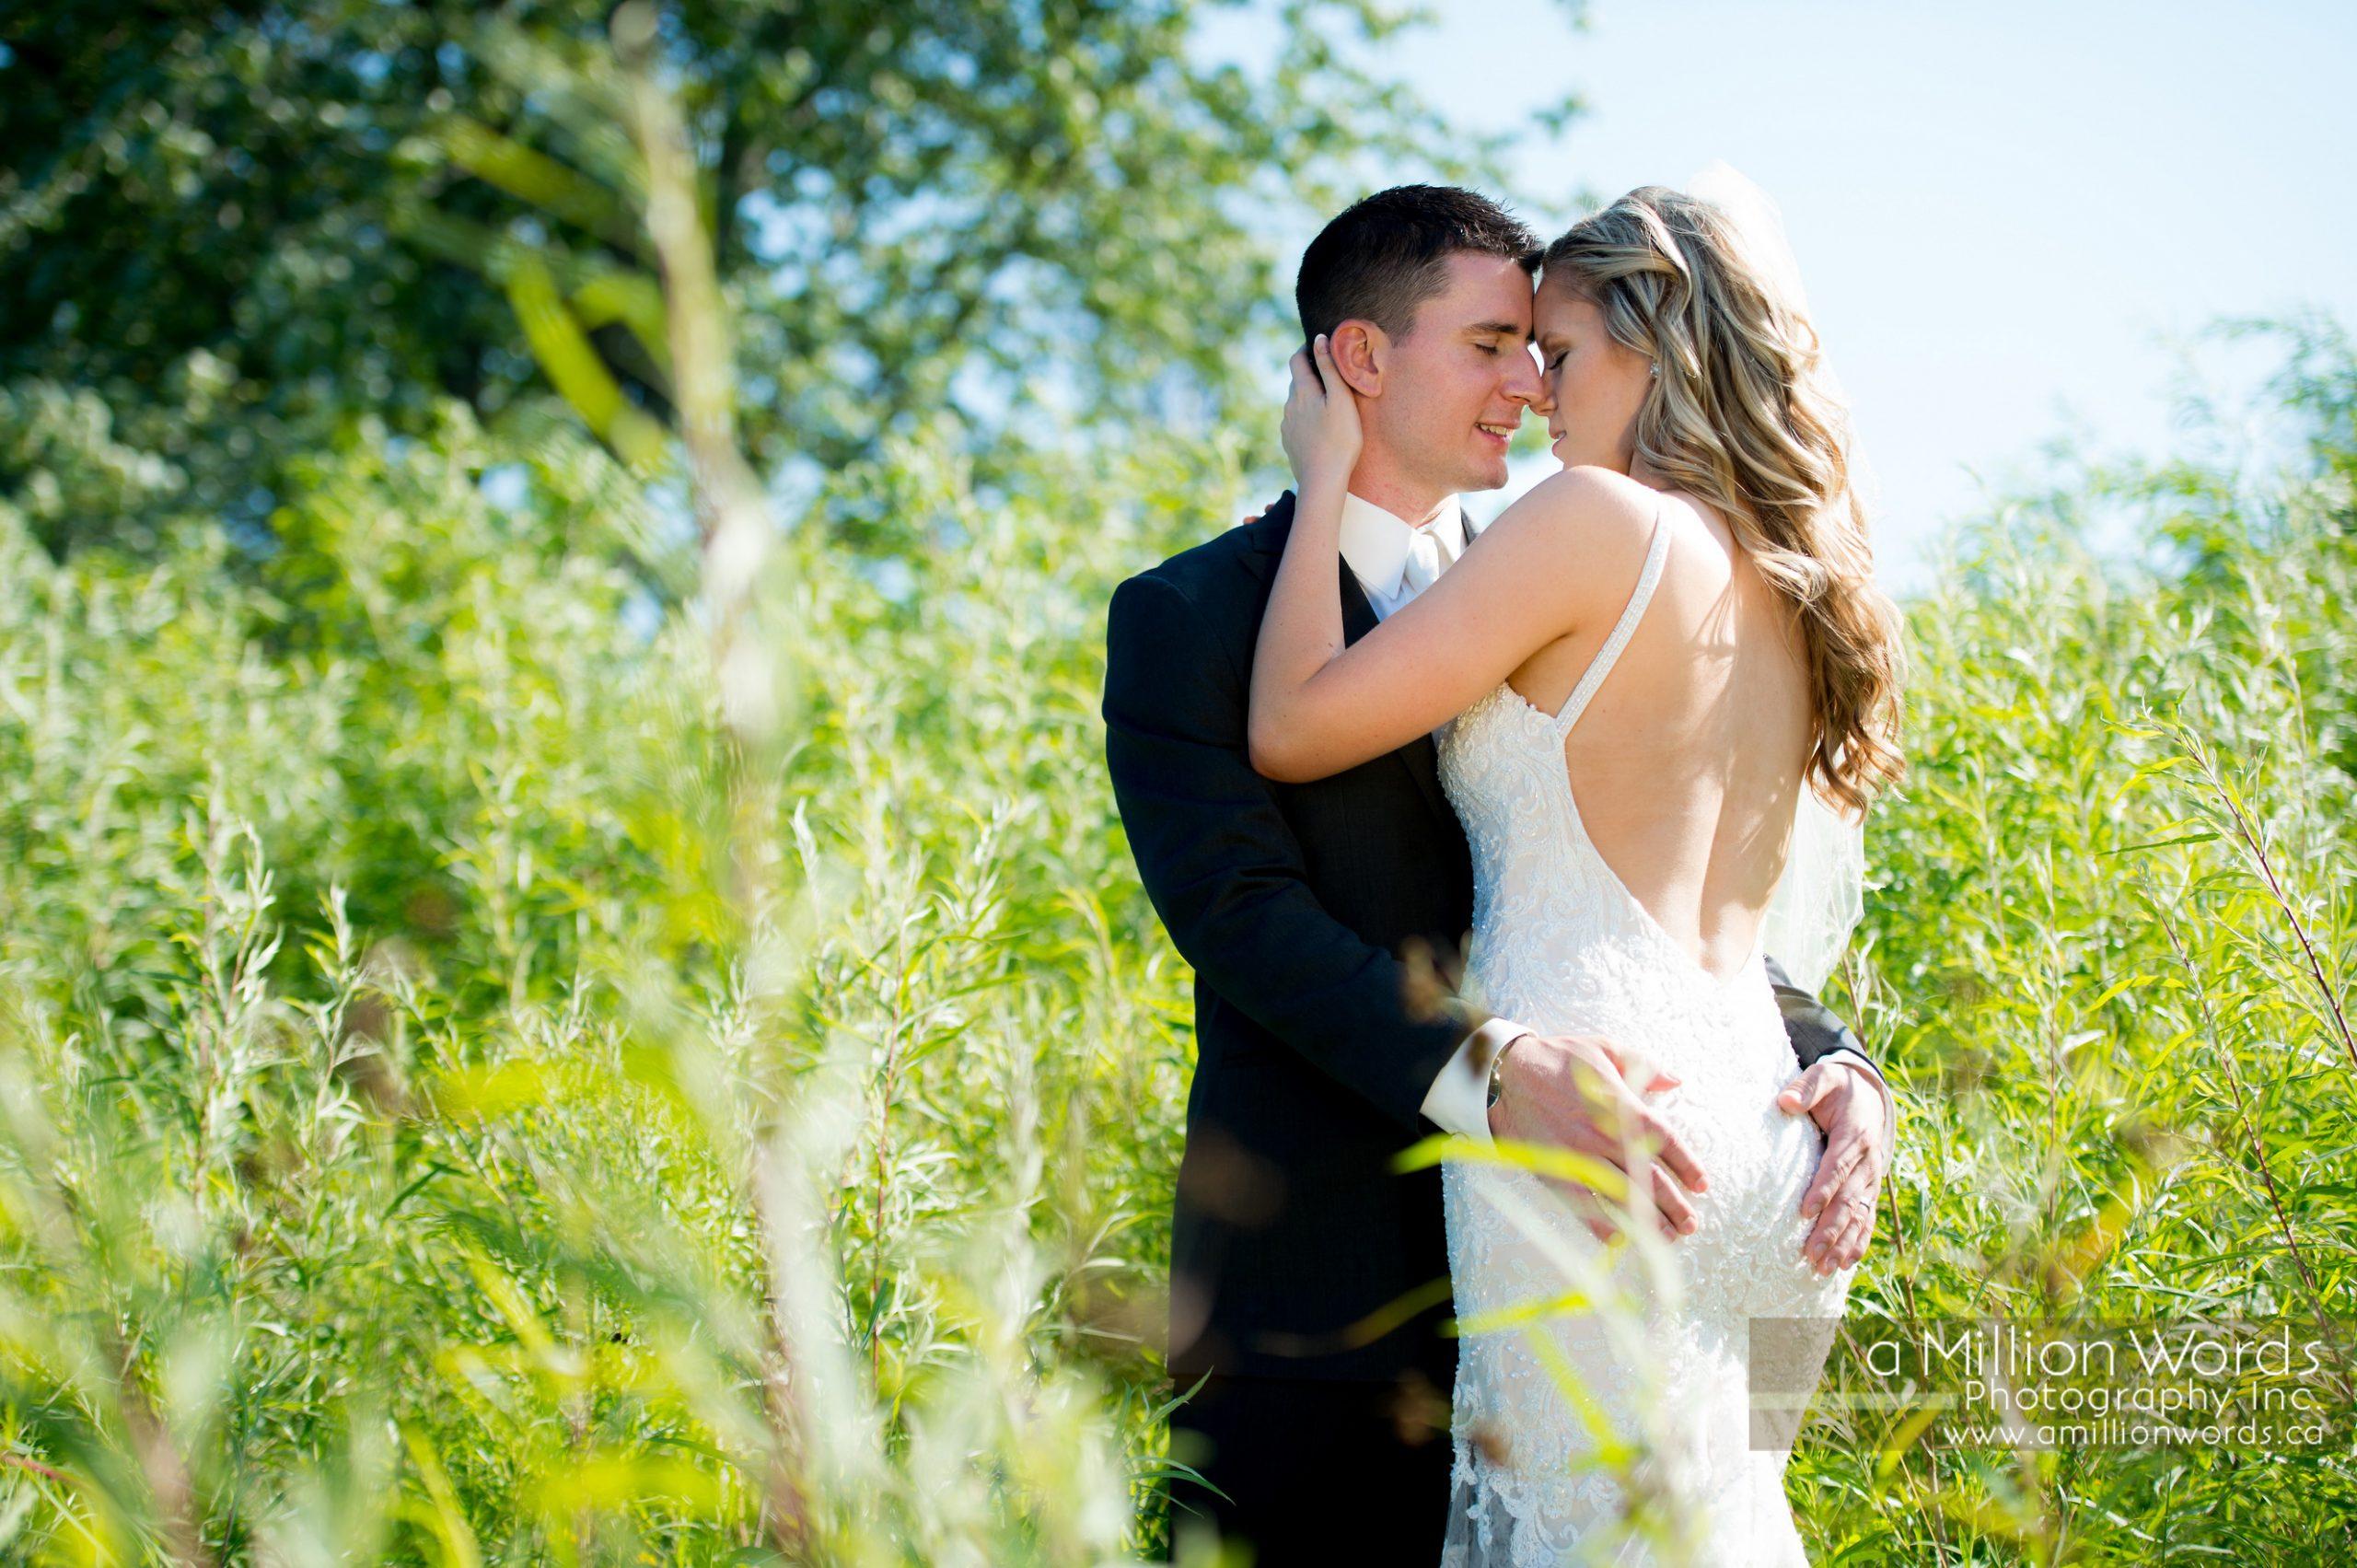 Arthur Wedding Photography